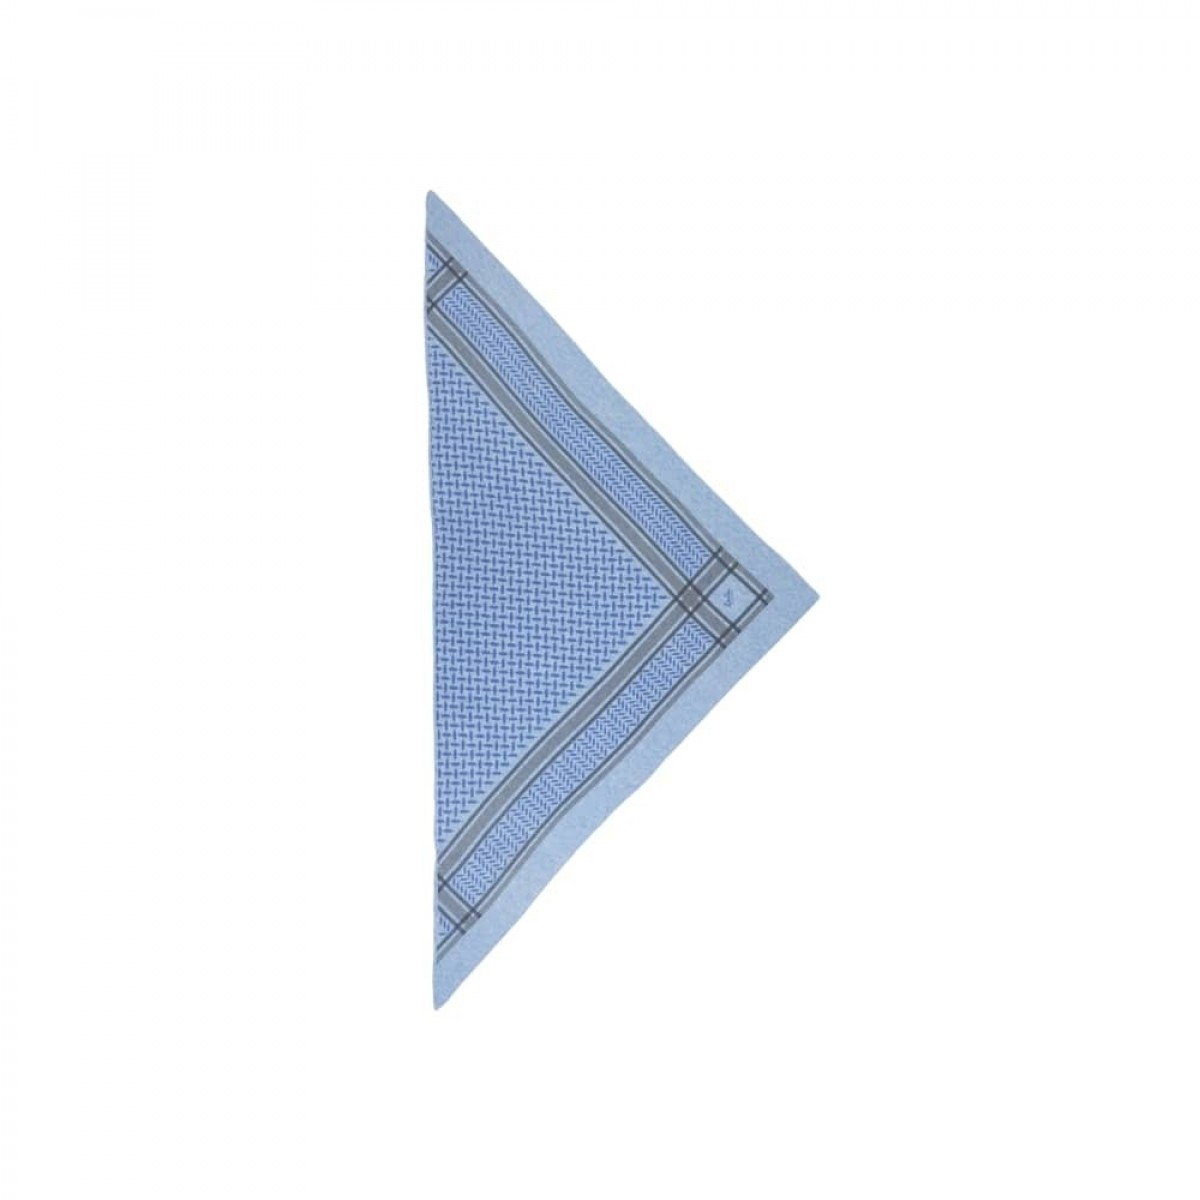 triangle trinity classic m - blue on criket - trekant blå